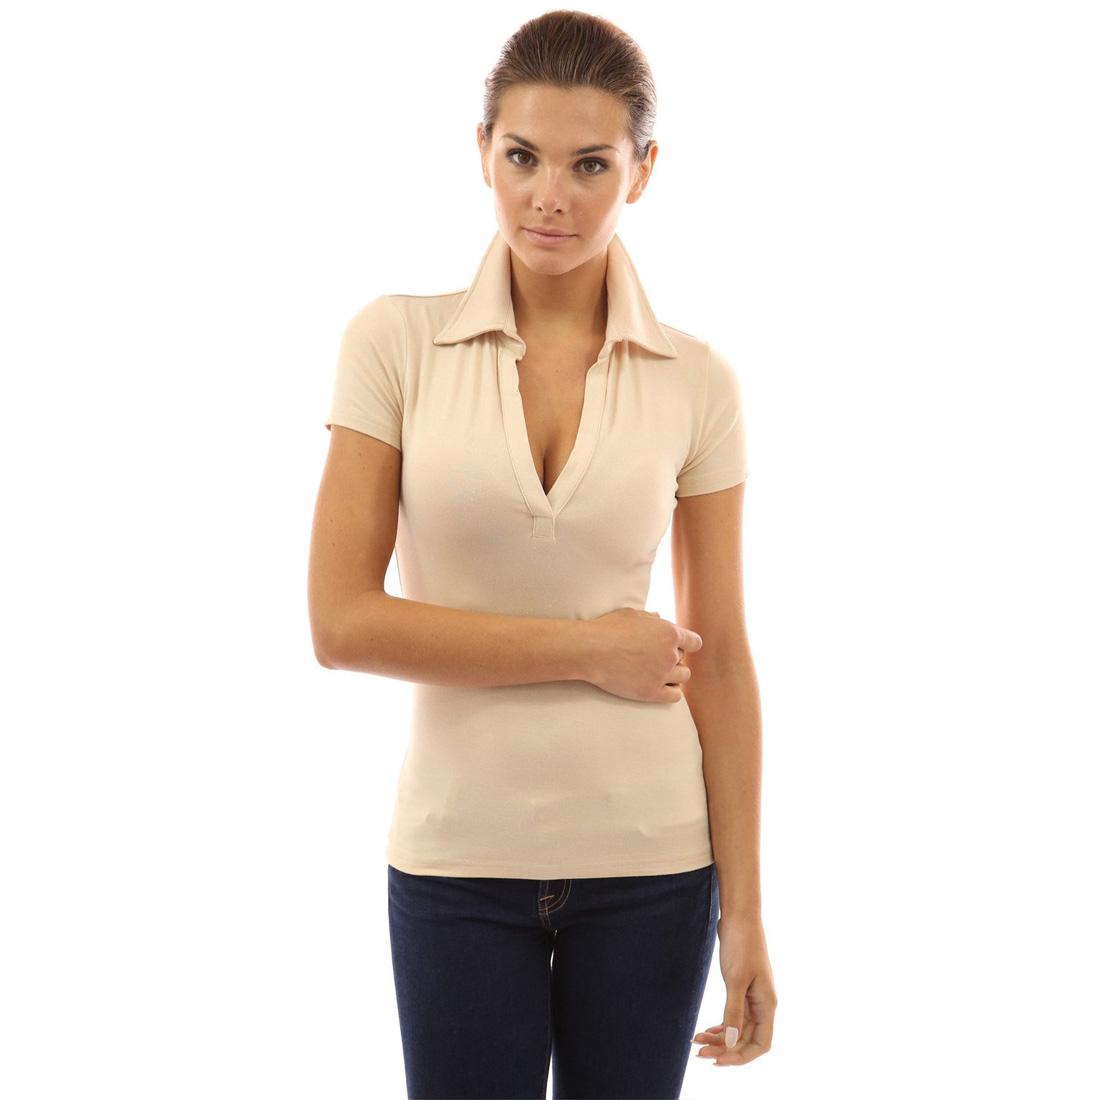 Womens v neck long sleeve polo shirt slim fit casual for Women s running shirt